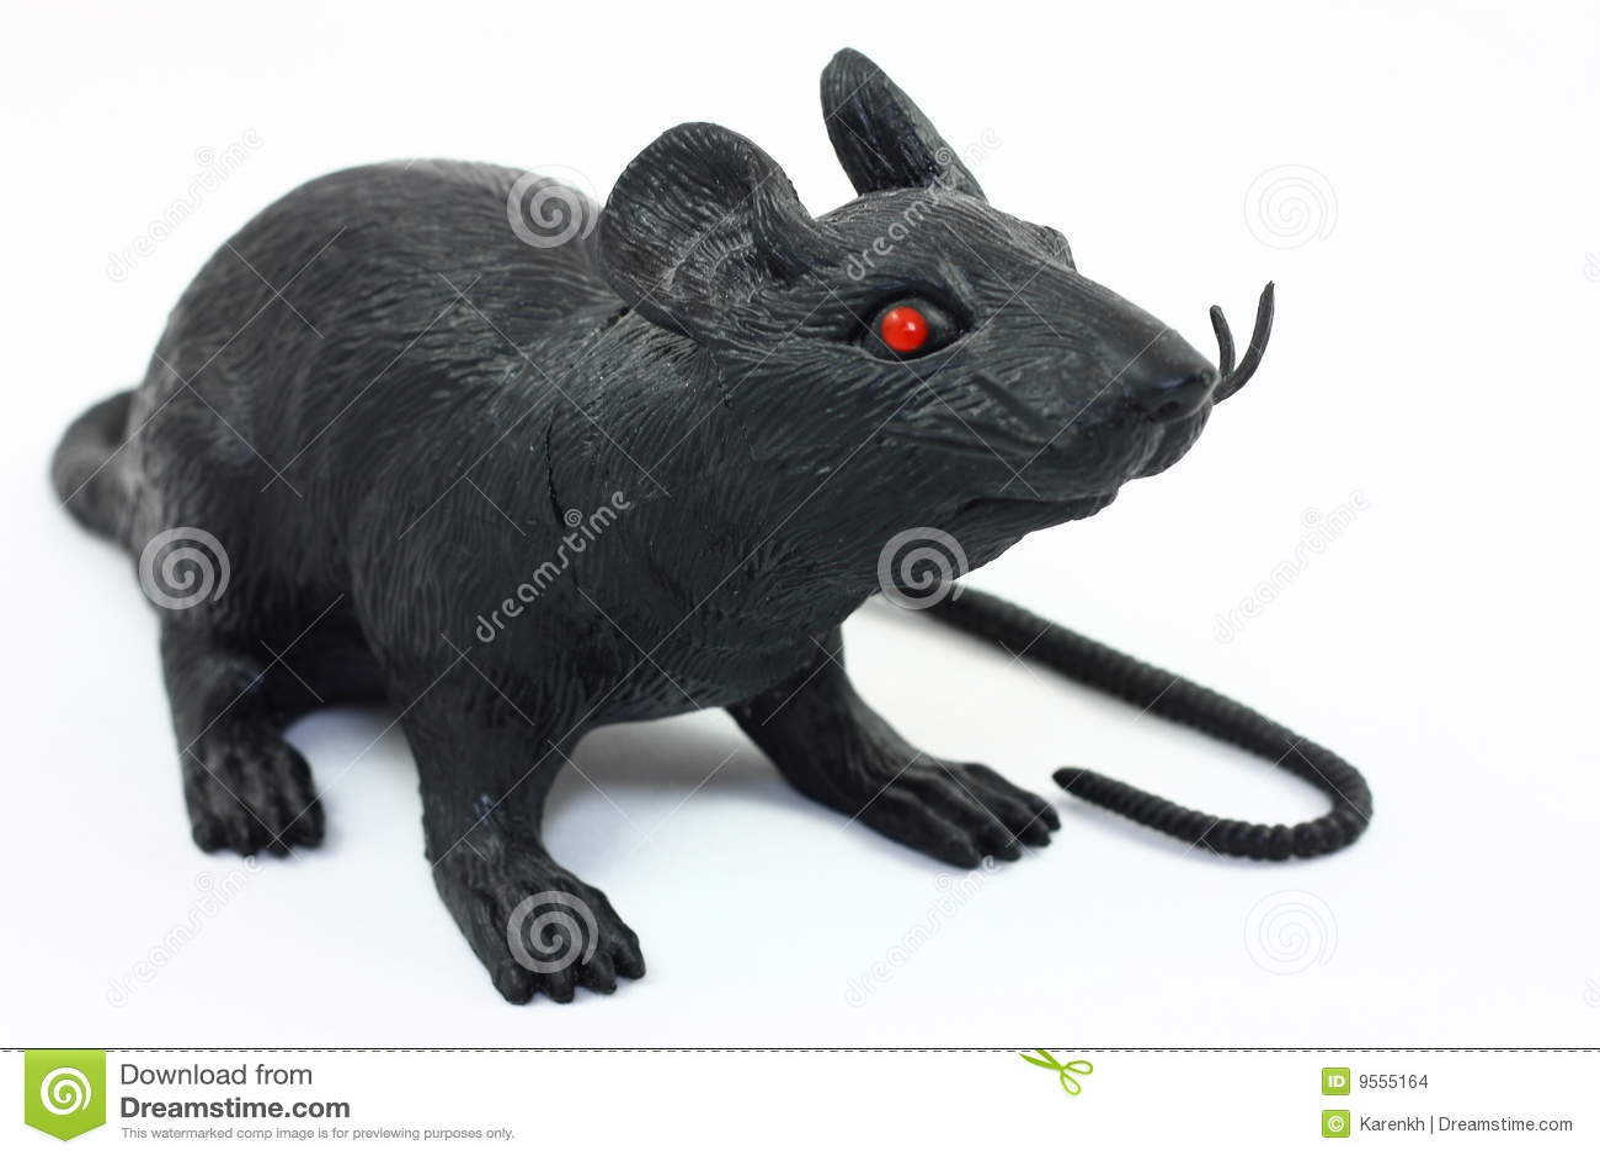 White rat with black eyes - photo#19